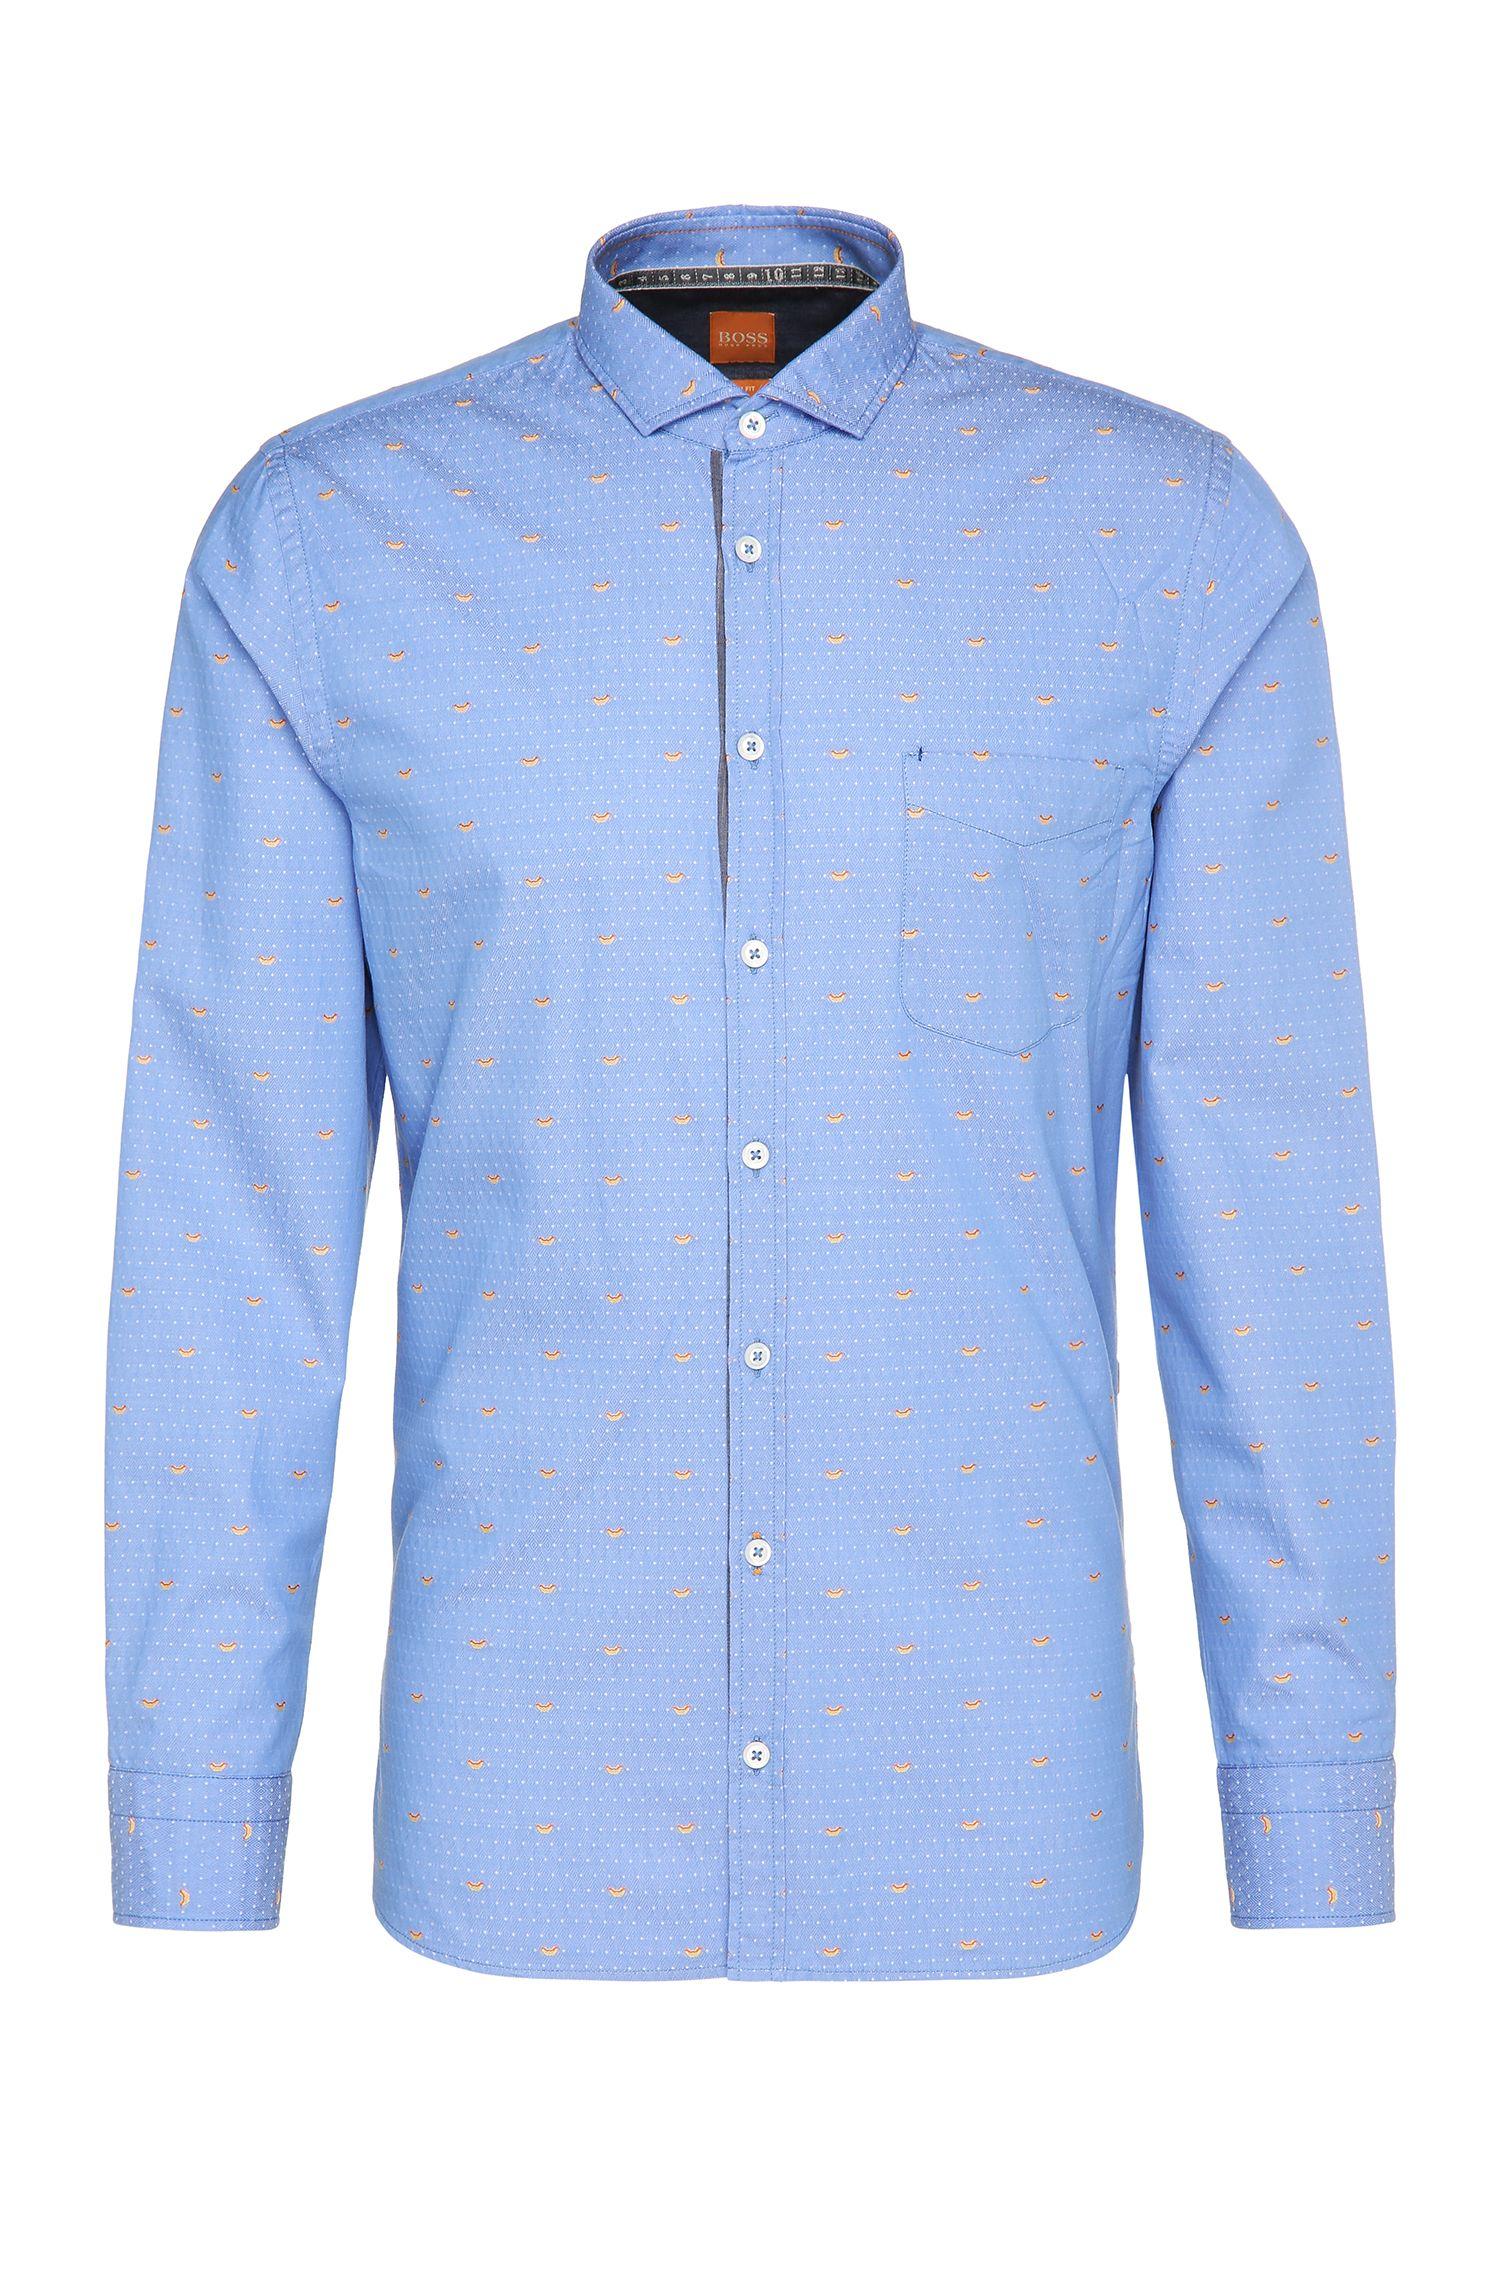 'Cattitude' | Slim Fit, Patterned Cotton Button Down Shirt